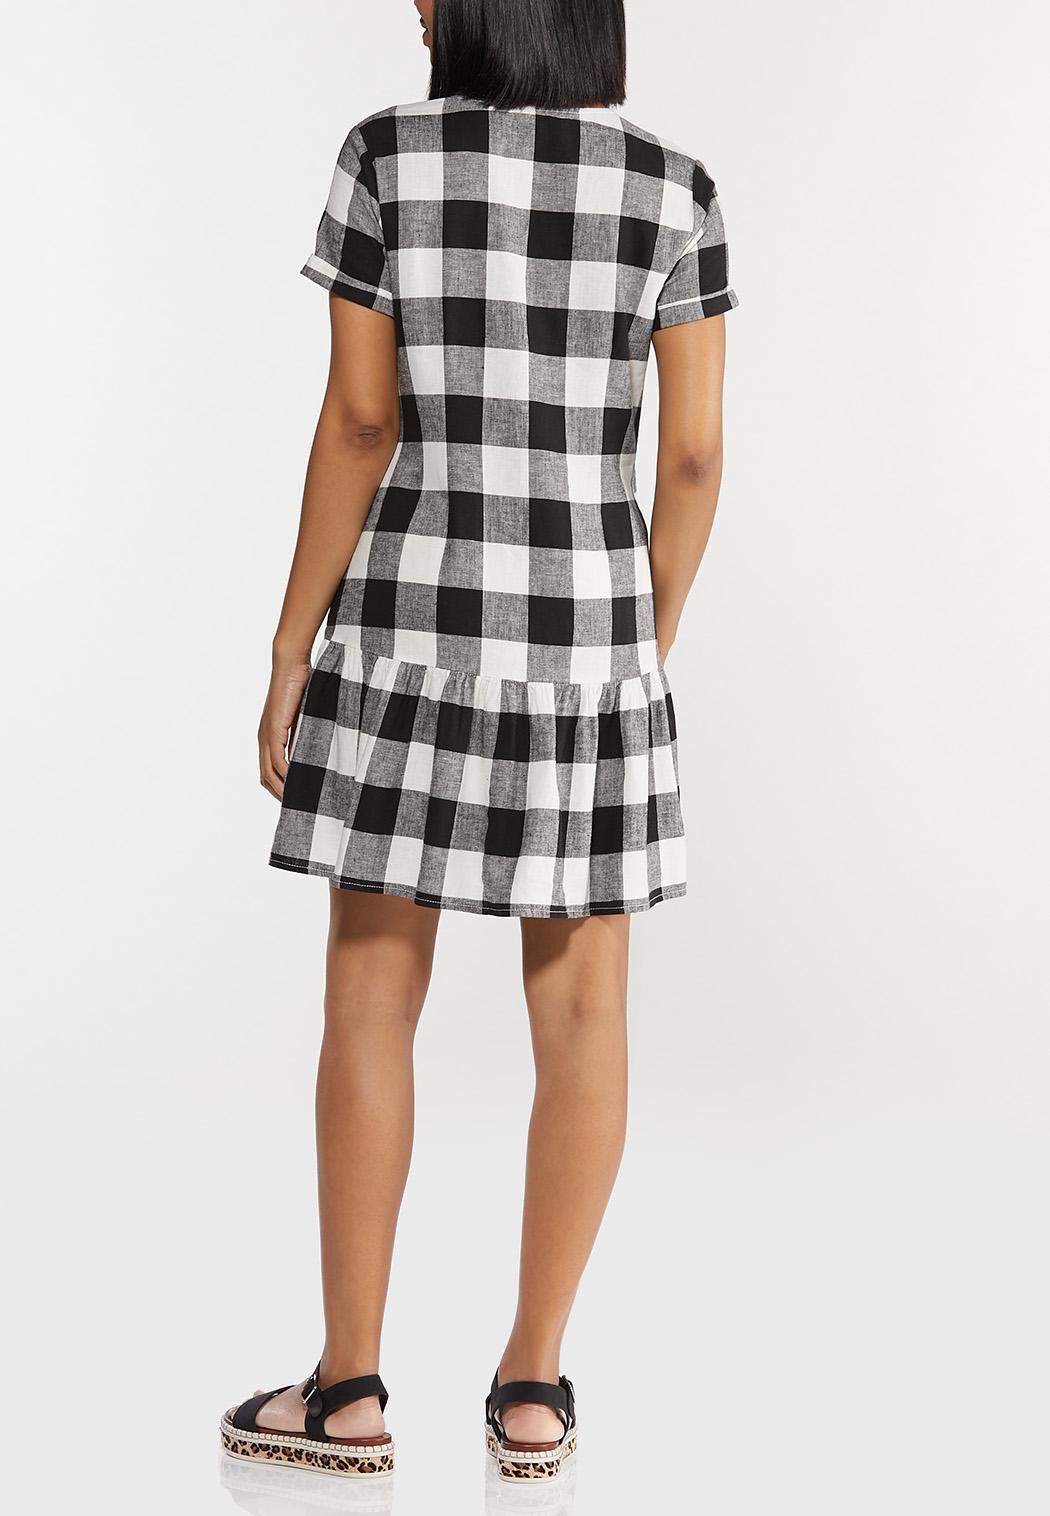 Plus Size Black And White Gingham Dress (Item #44502579)